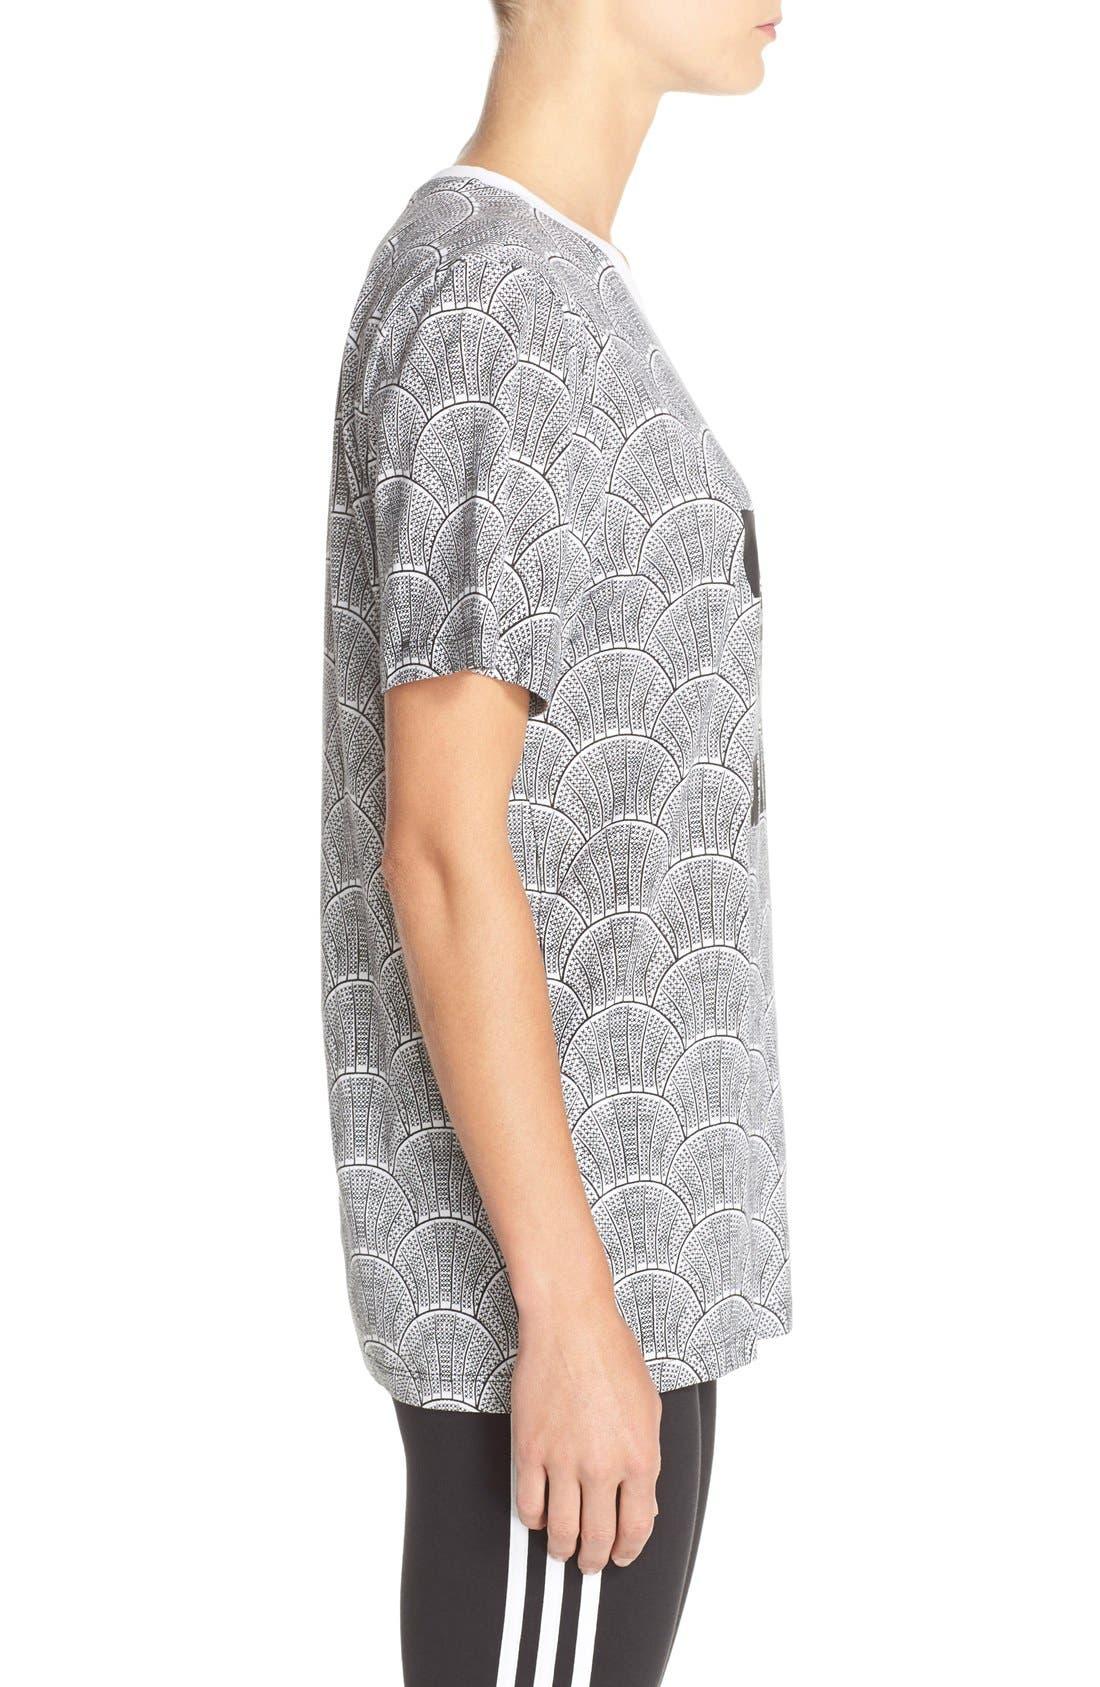 Alternate Image 3  - adidas Originals 'Shell Tile' Boyfriend Tee